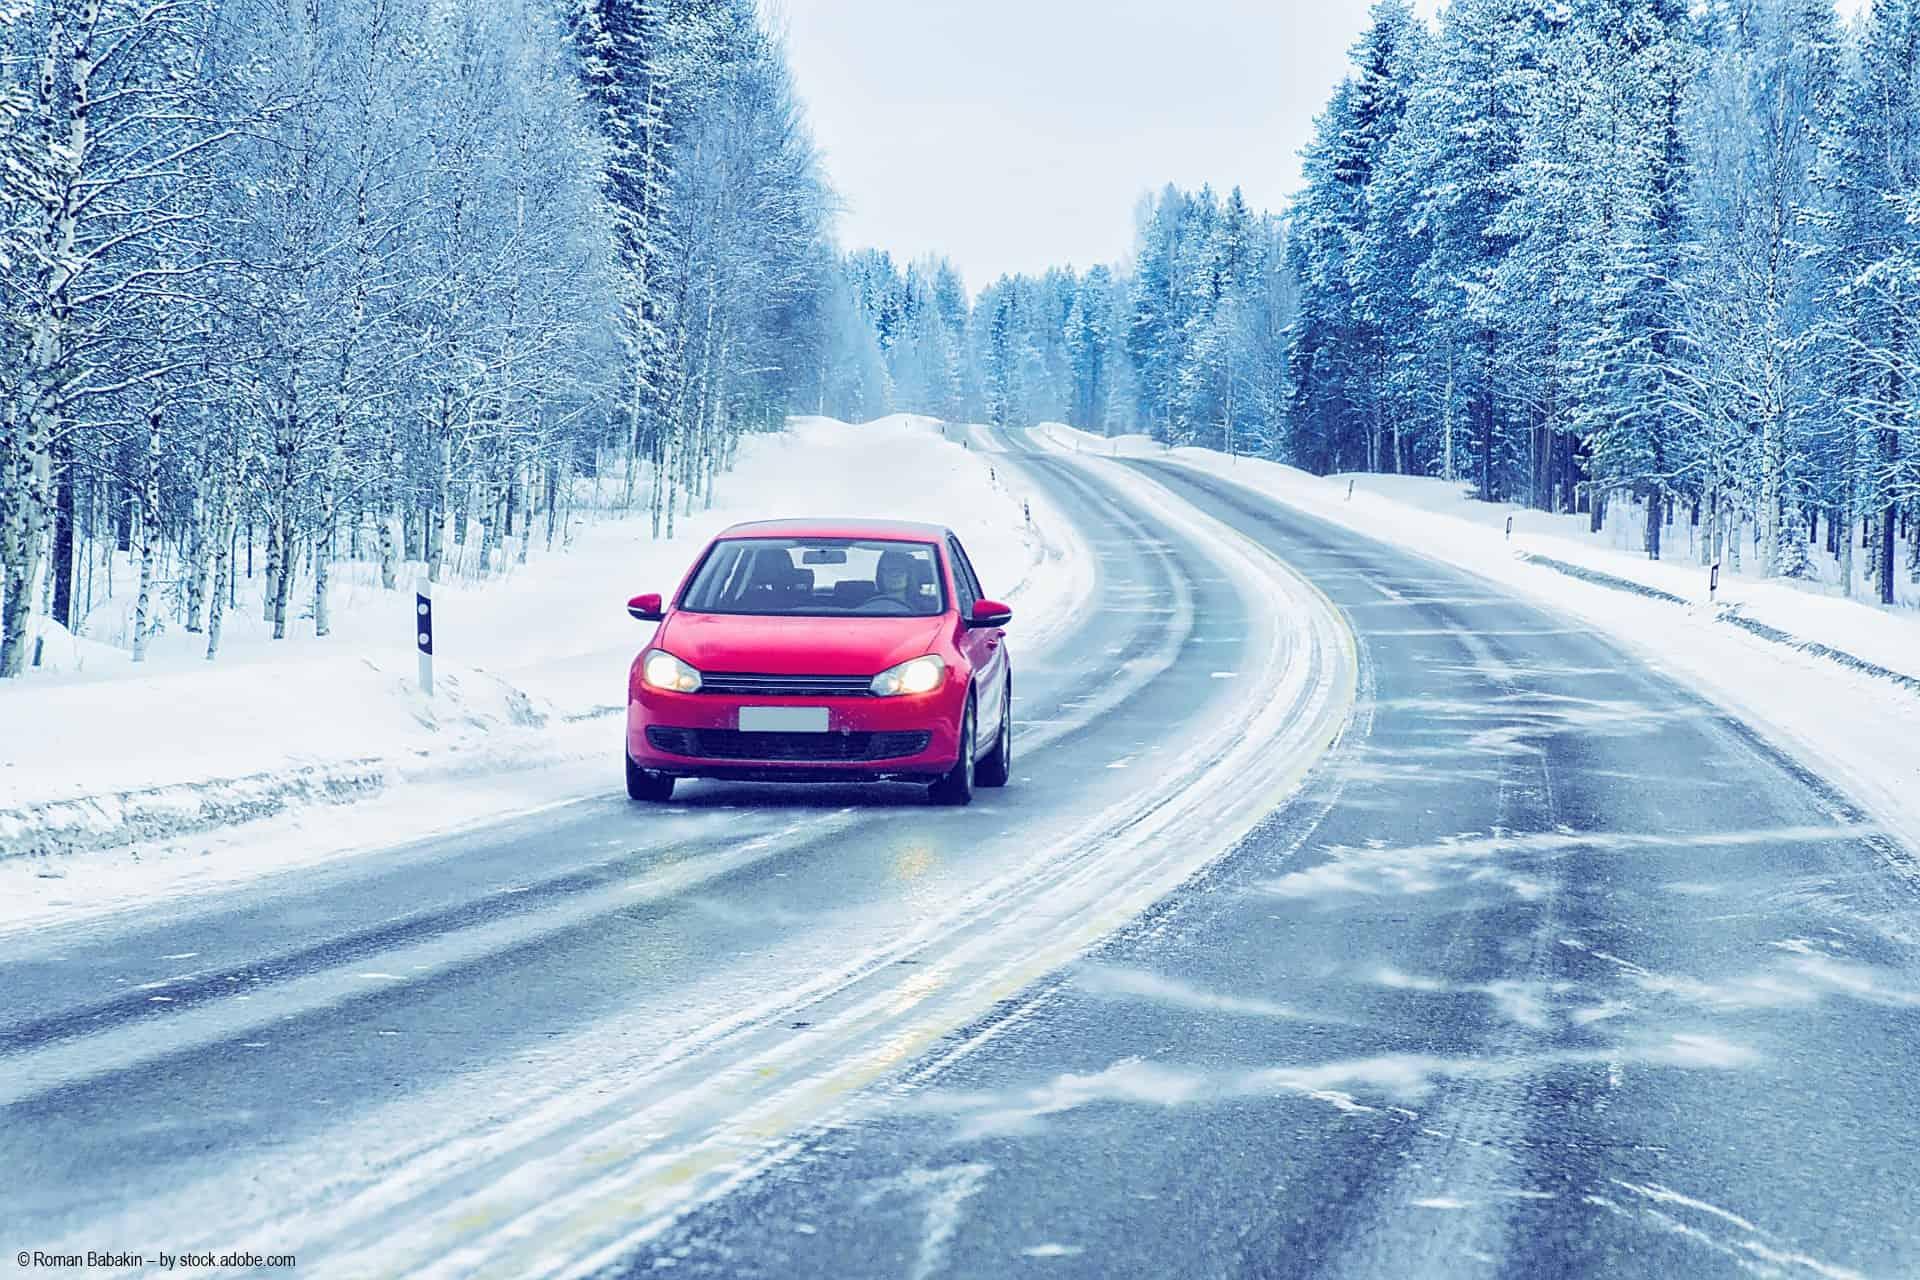 autopflege im winter2